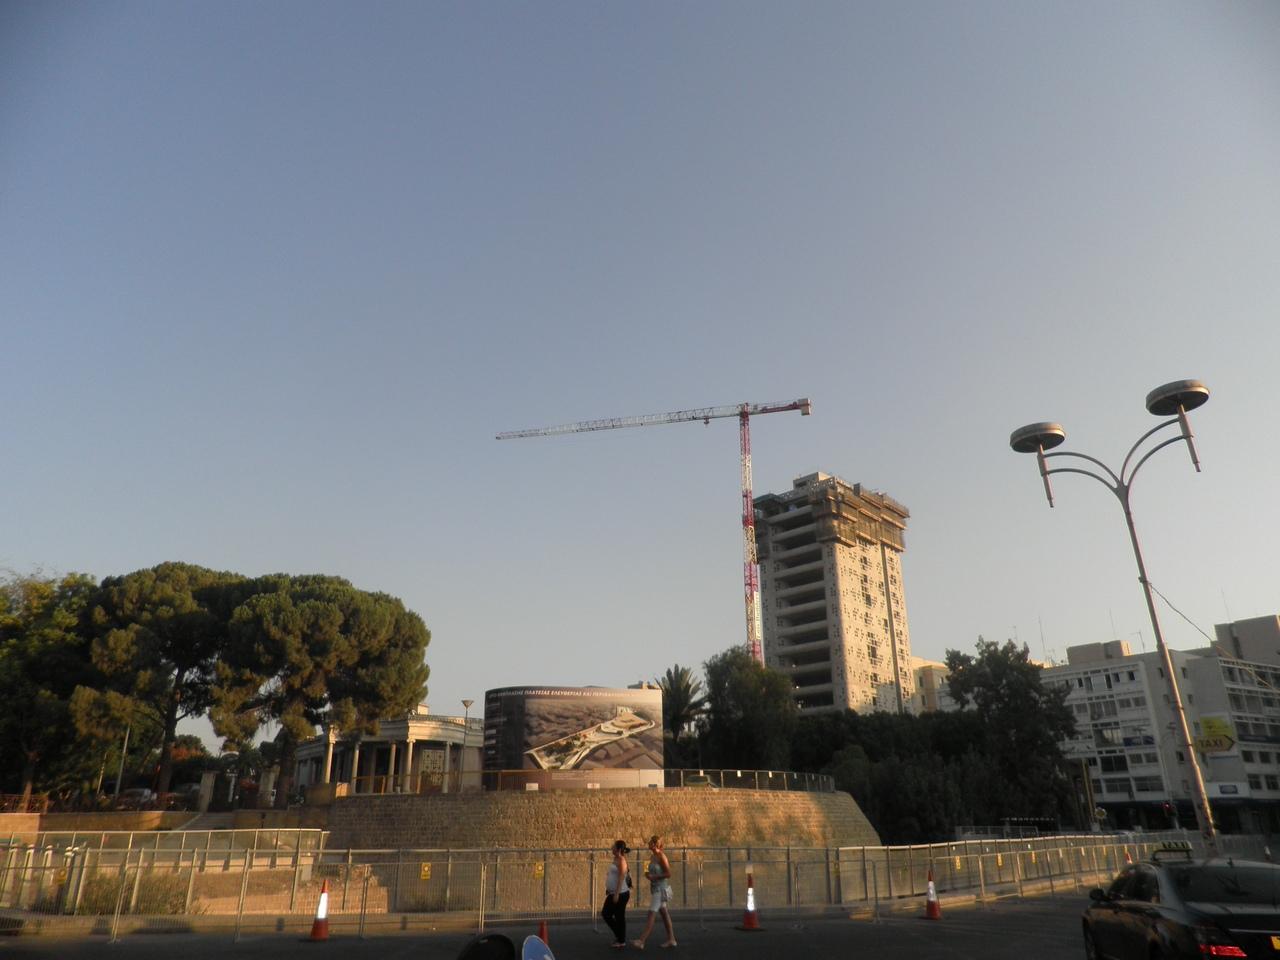 IUgDV9t2f1Y Никосия (Лефкосия) столица Кипра.